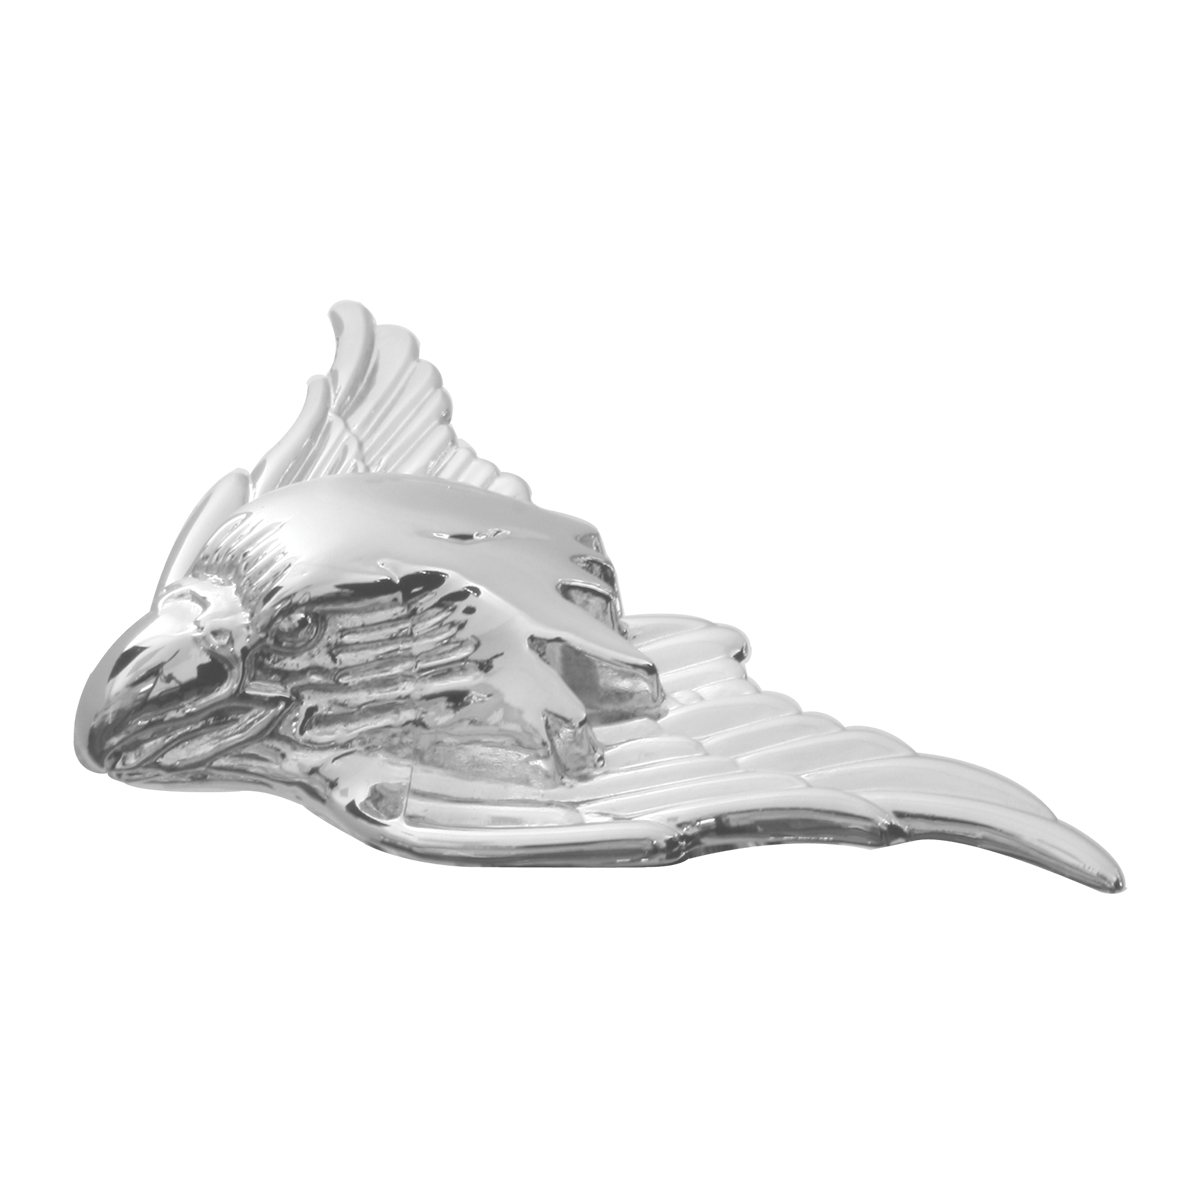 "#94050 Small 4"" x 2 ⅜"" (W) x ¾"" (H) War Eagle Emblem Headlight Cover"